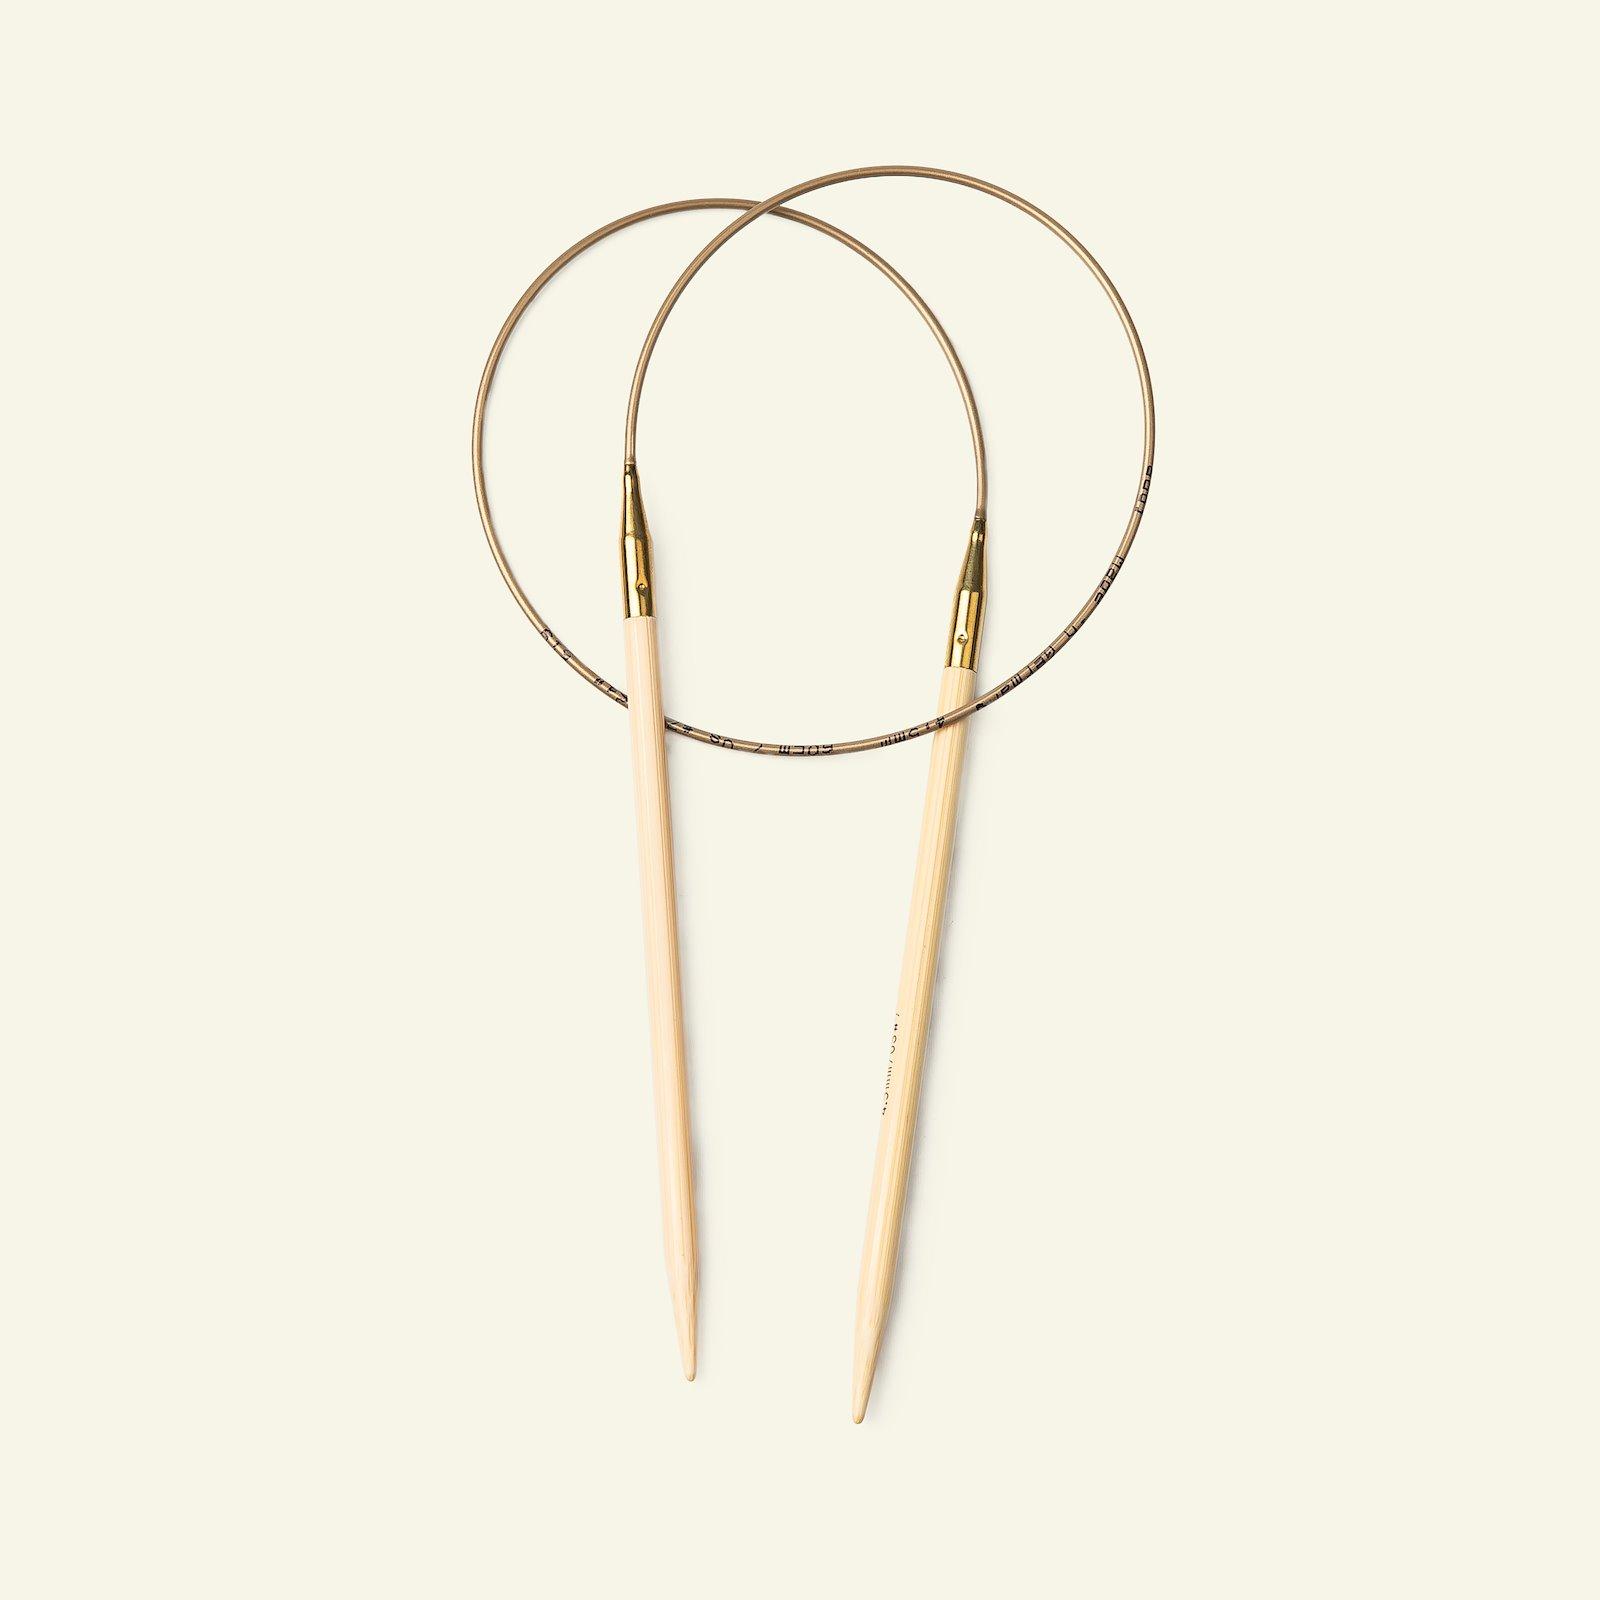 Addi circular needle bamboo 60cm 2,5mm 83109_pack